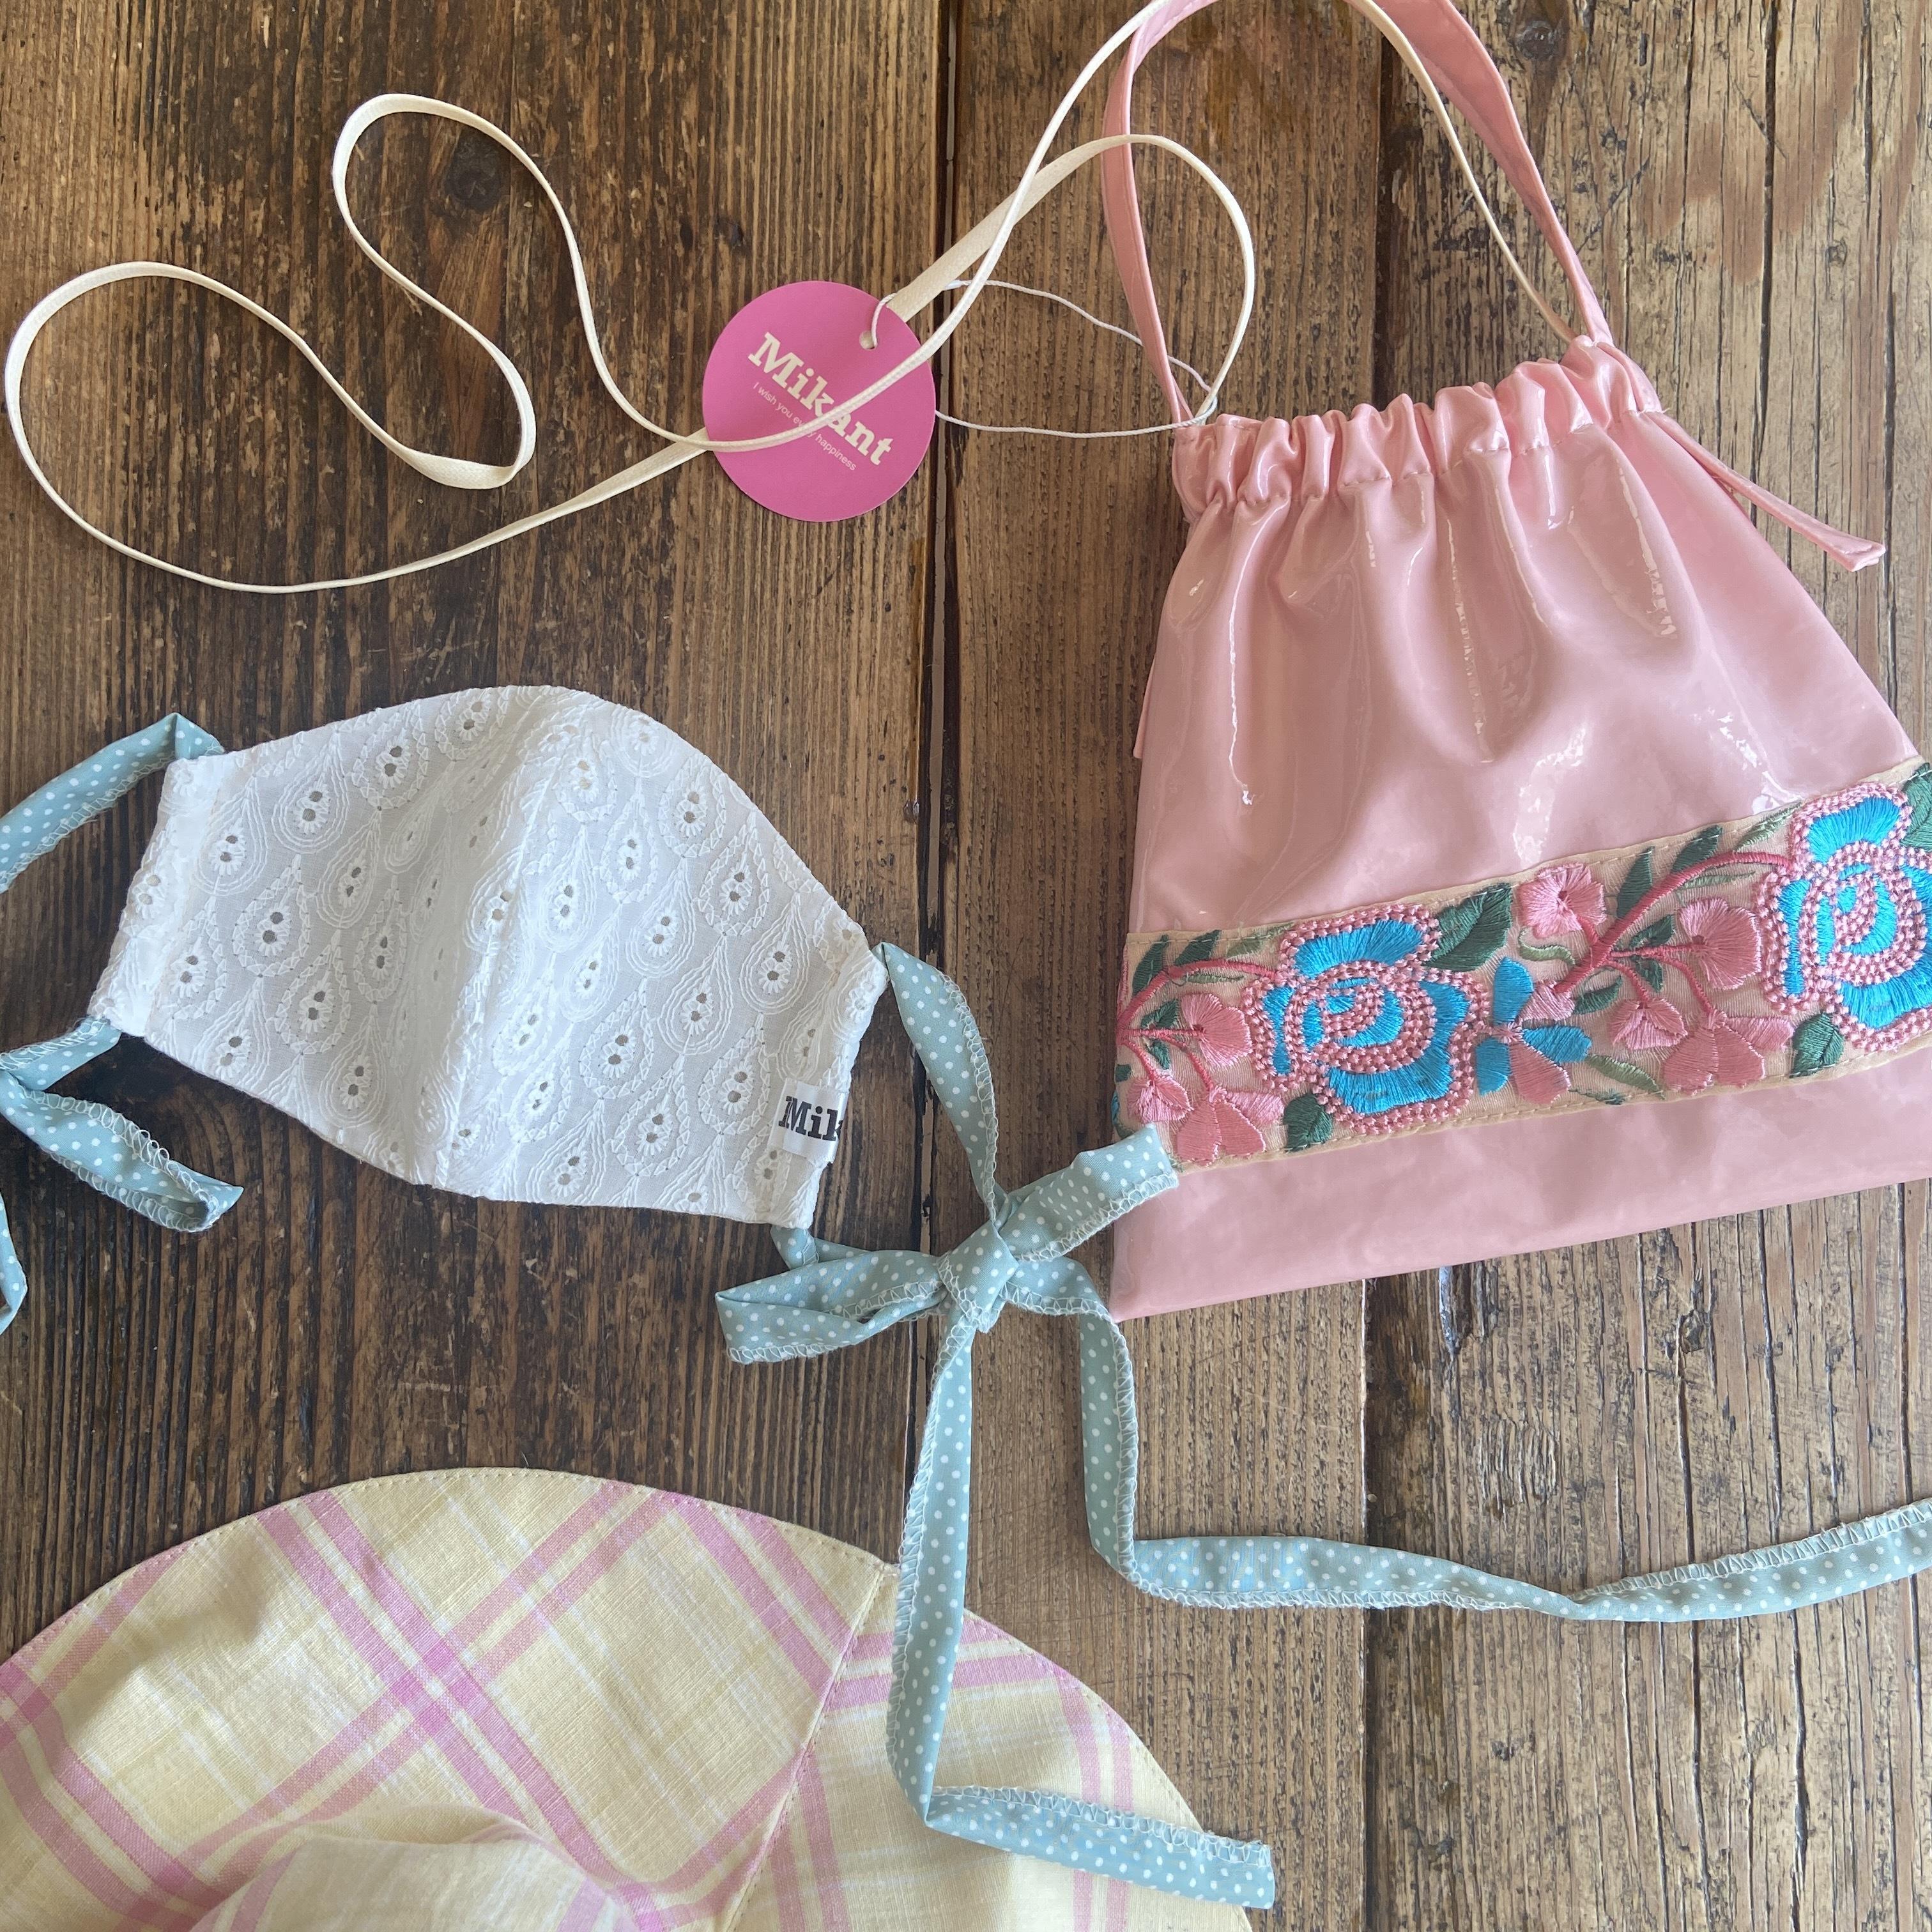 Lax micro Bag お花刺繍